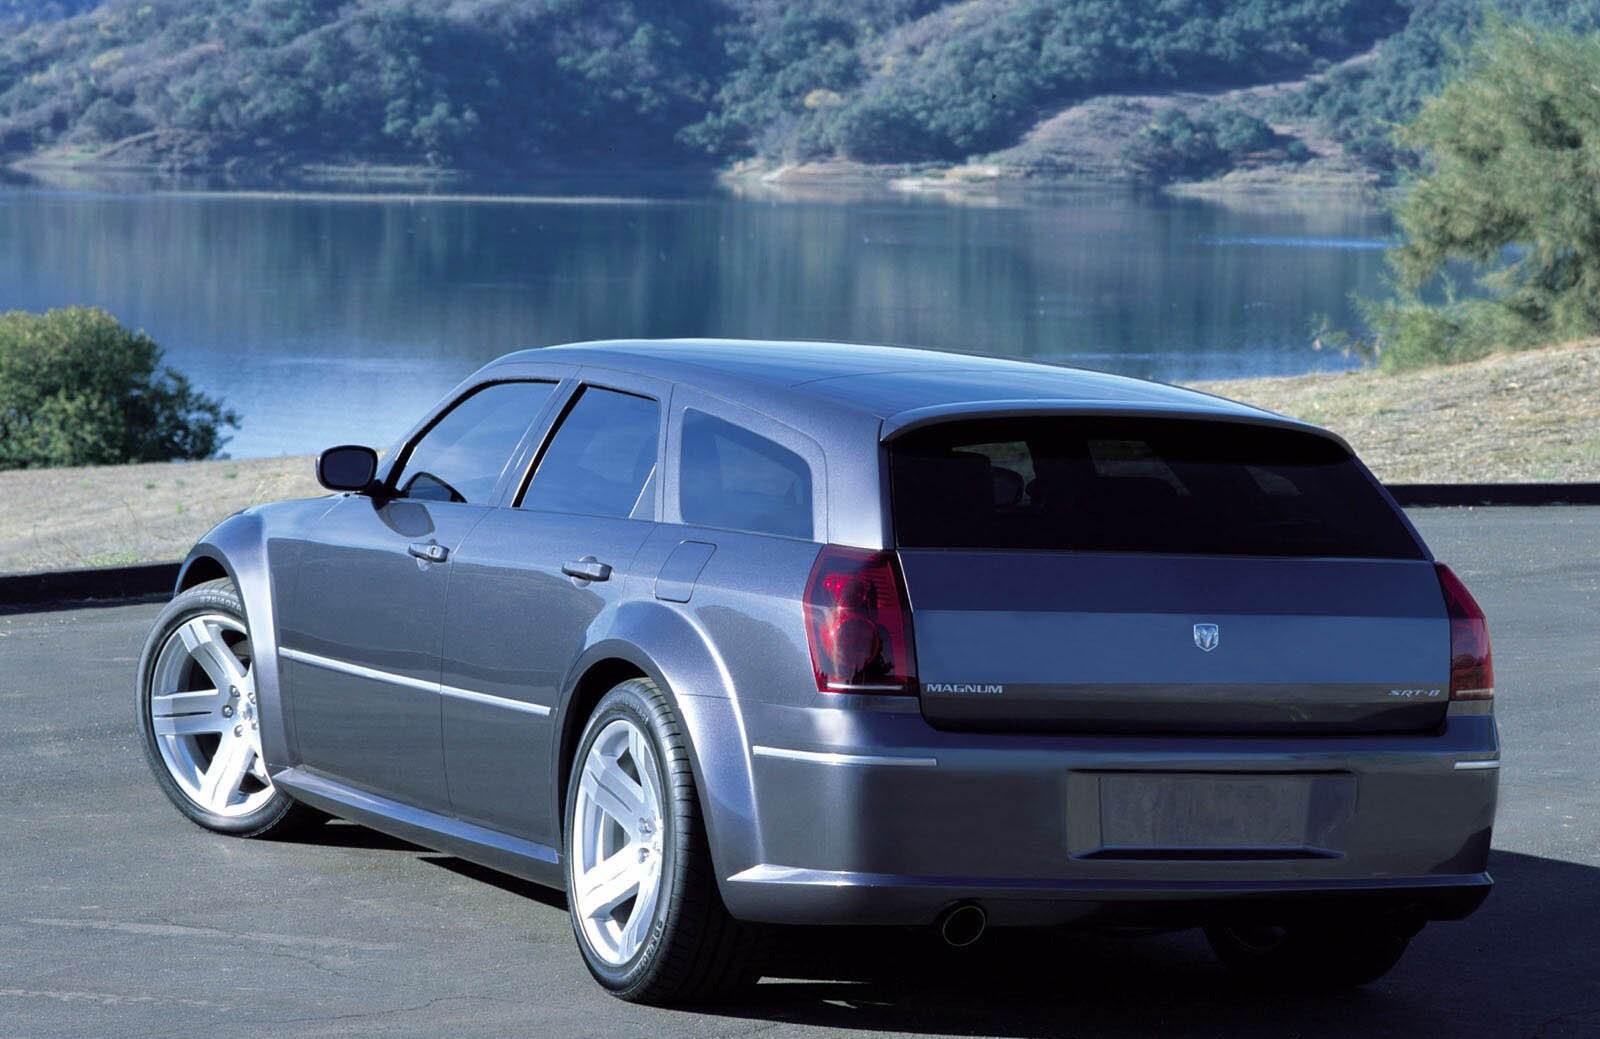 Dodge Magnum Rt Rims | www.galleryhip.com - The Hippest Pics